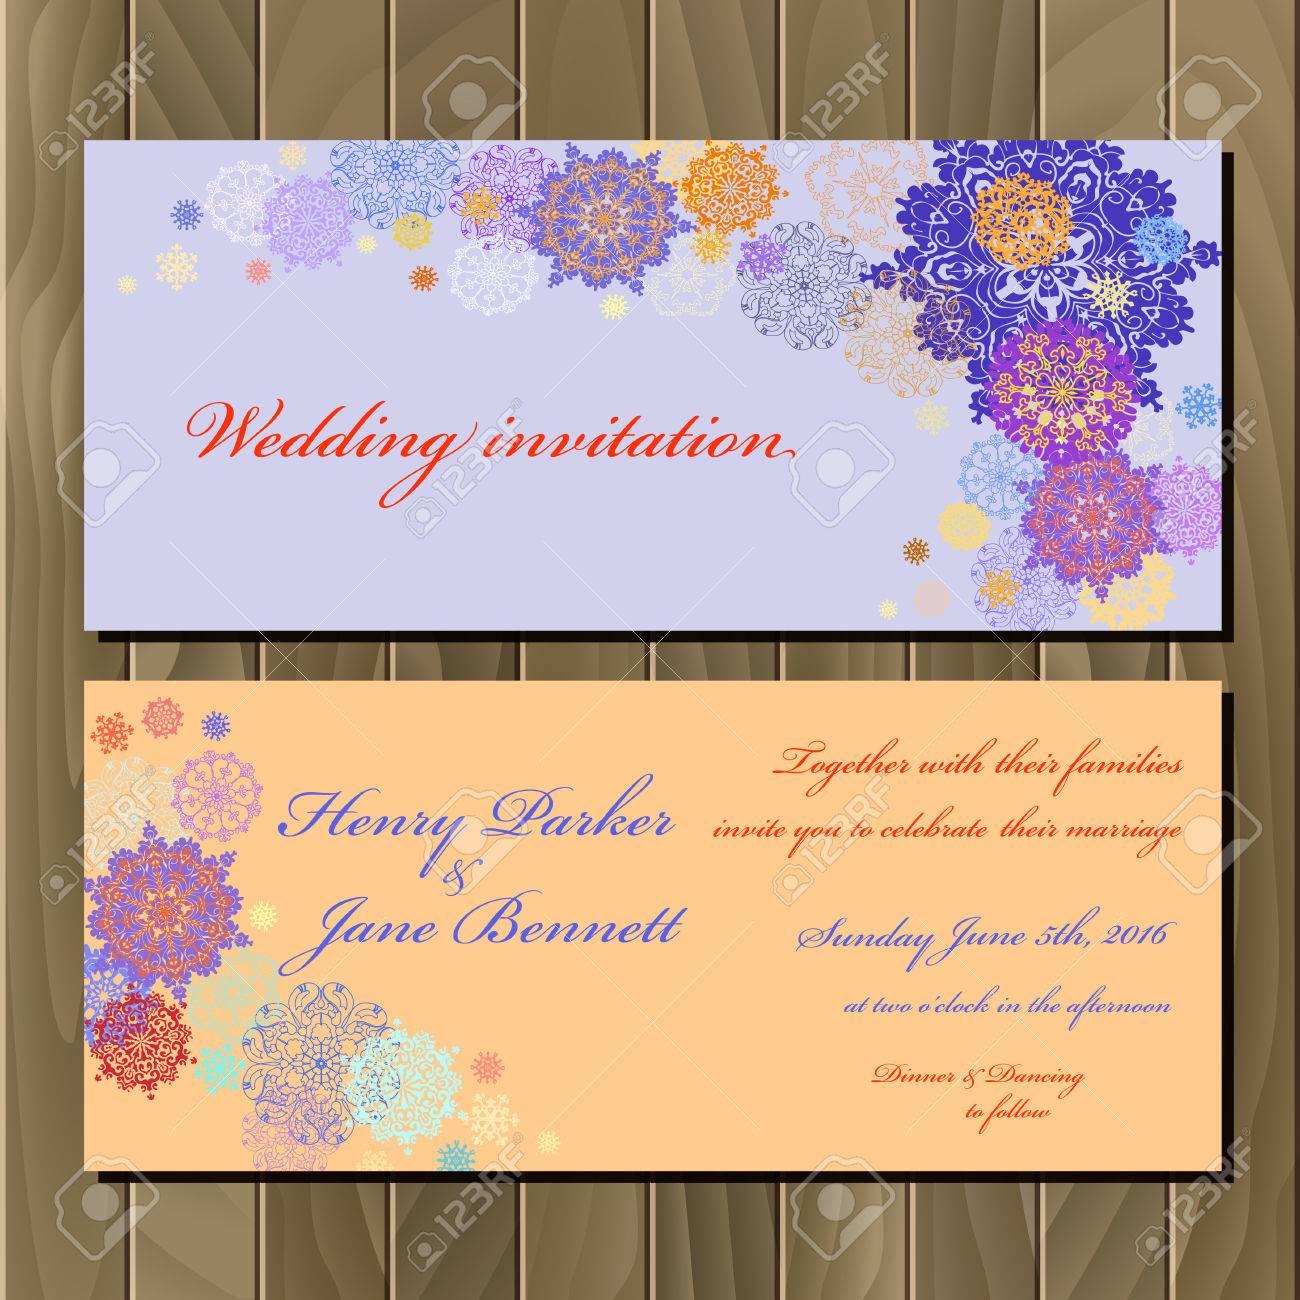 Wedding snowflakes invitation card with violet pink gold blue vector wedding snowflakes invitation card with violet pink gold blue and white snowflakes and stars and violet and peach background stopboris Choice Image